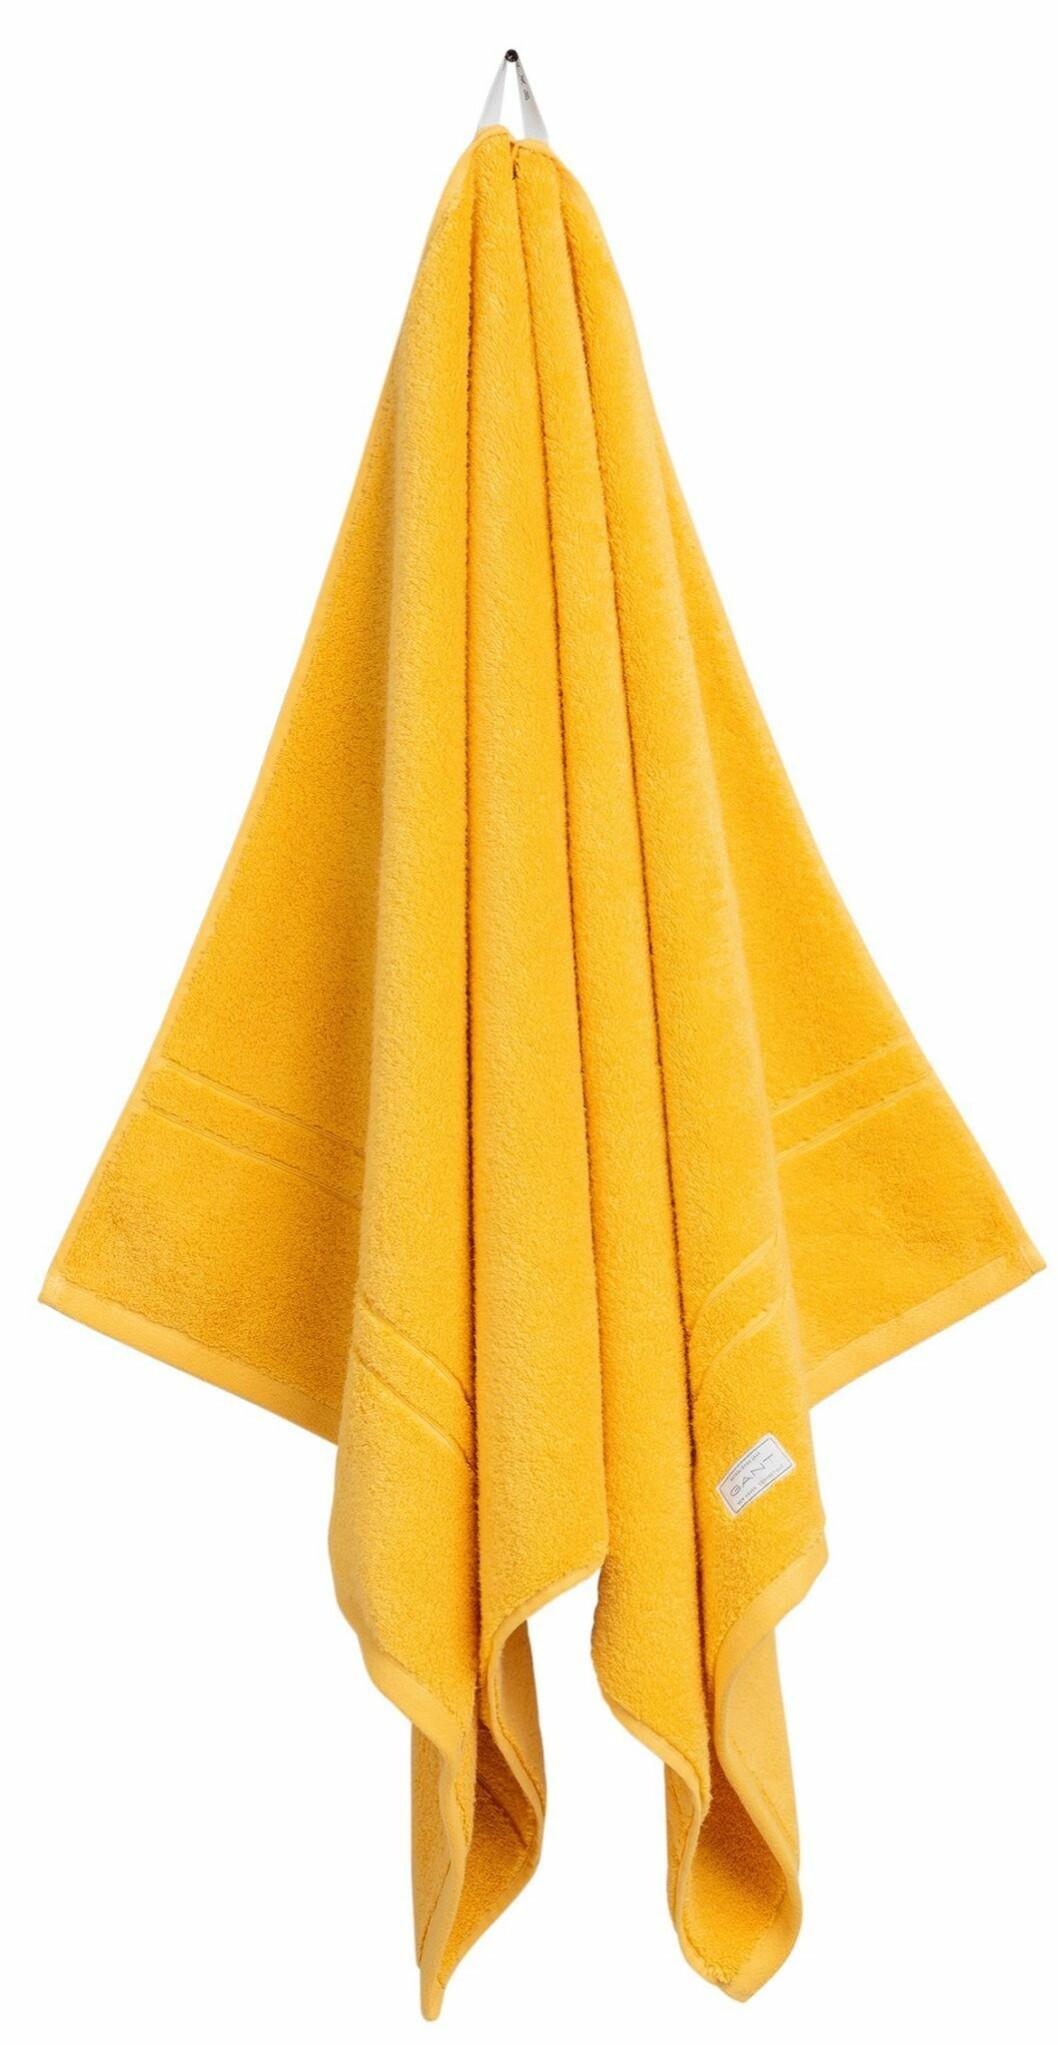 gul handduk i ekologisk bomull från Gant home